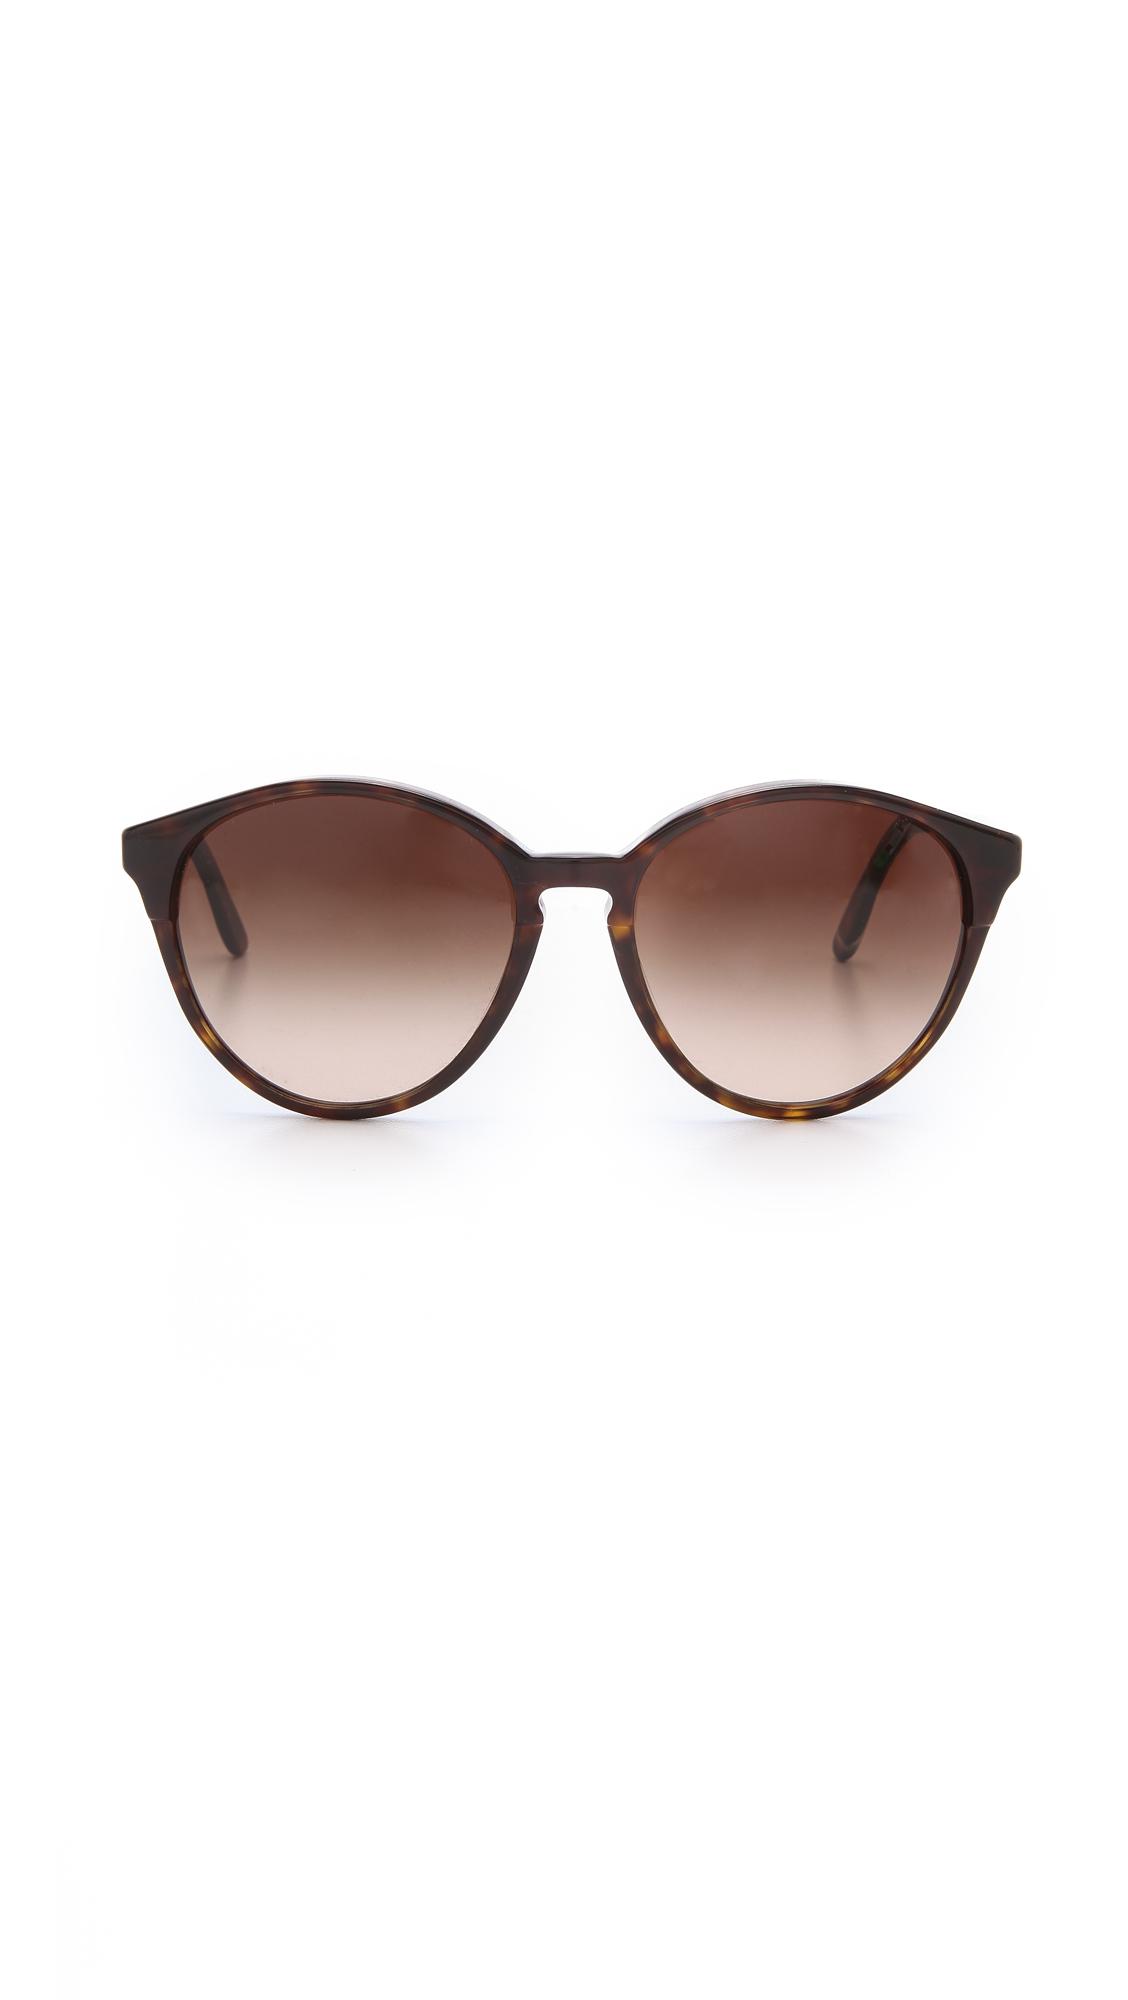 d129212d2d5d Stella McCartney Oversized Round Sunglasses